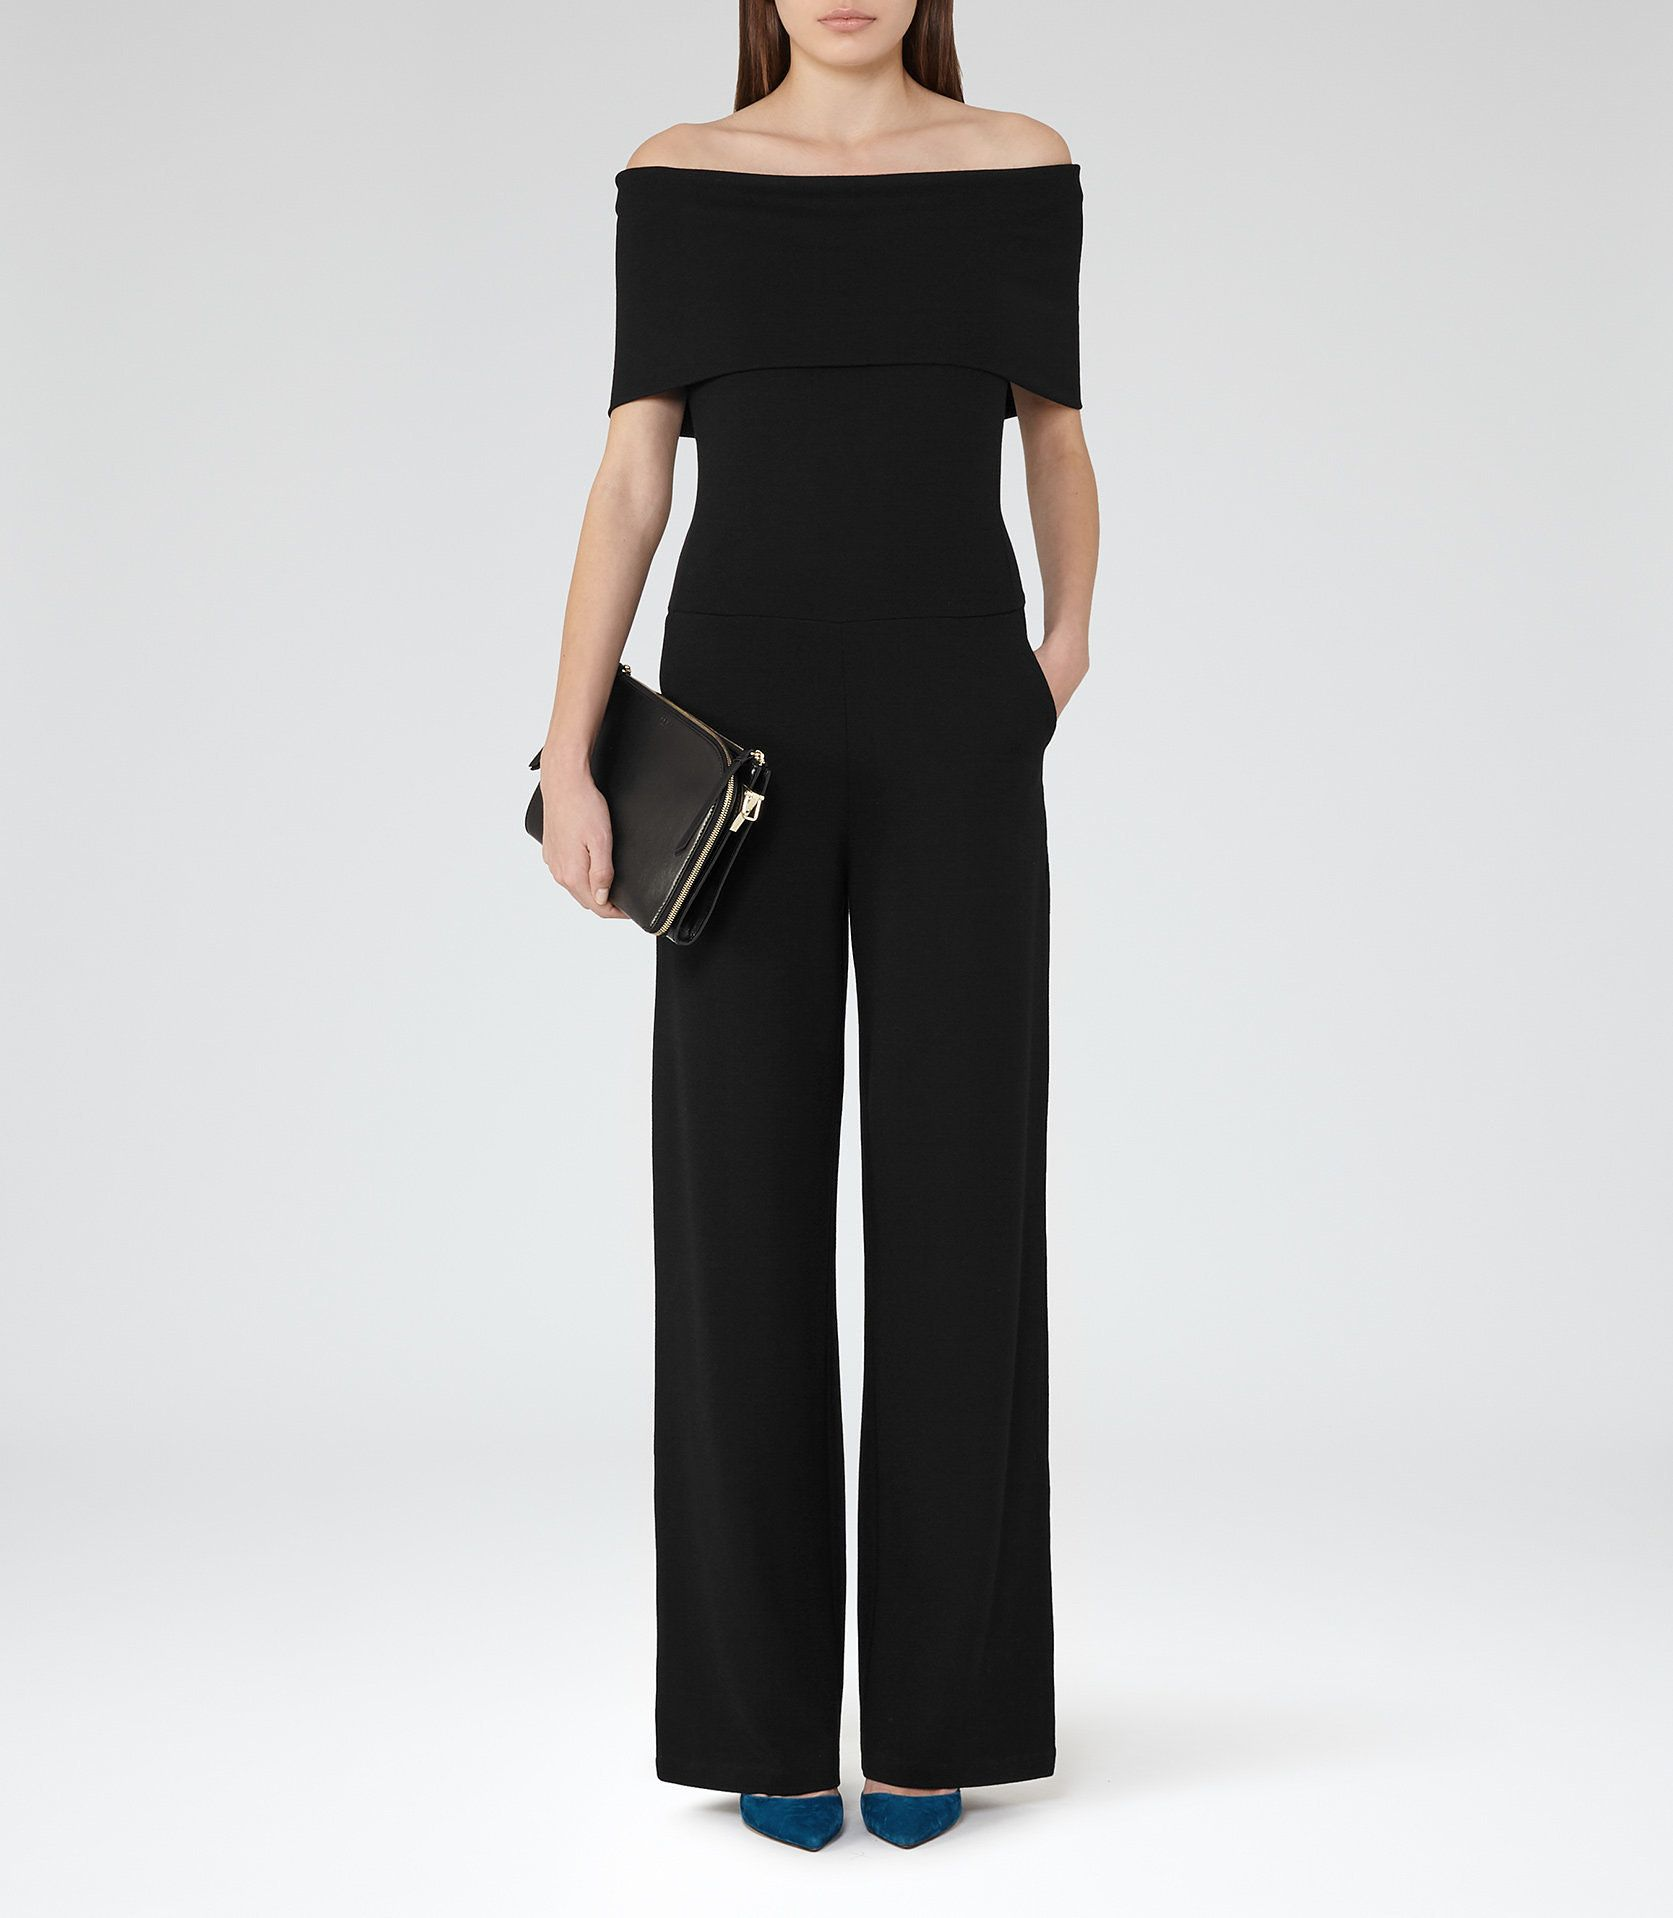 adff079665d Women s Clothes - Trendy Fashion Clothing For Sale Online. Raffi Black  Off-The-Shoulder Jumpsuit - REISS